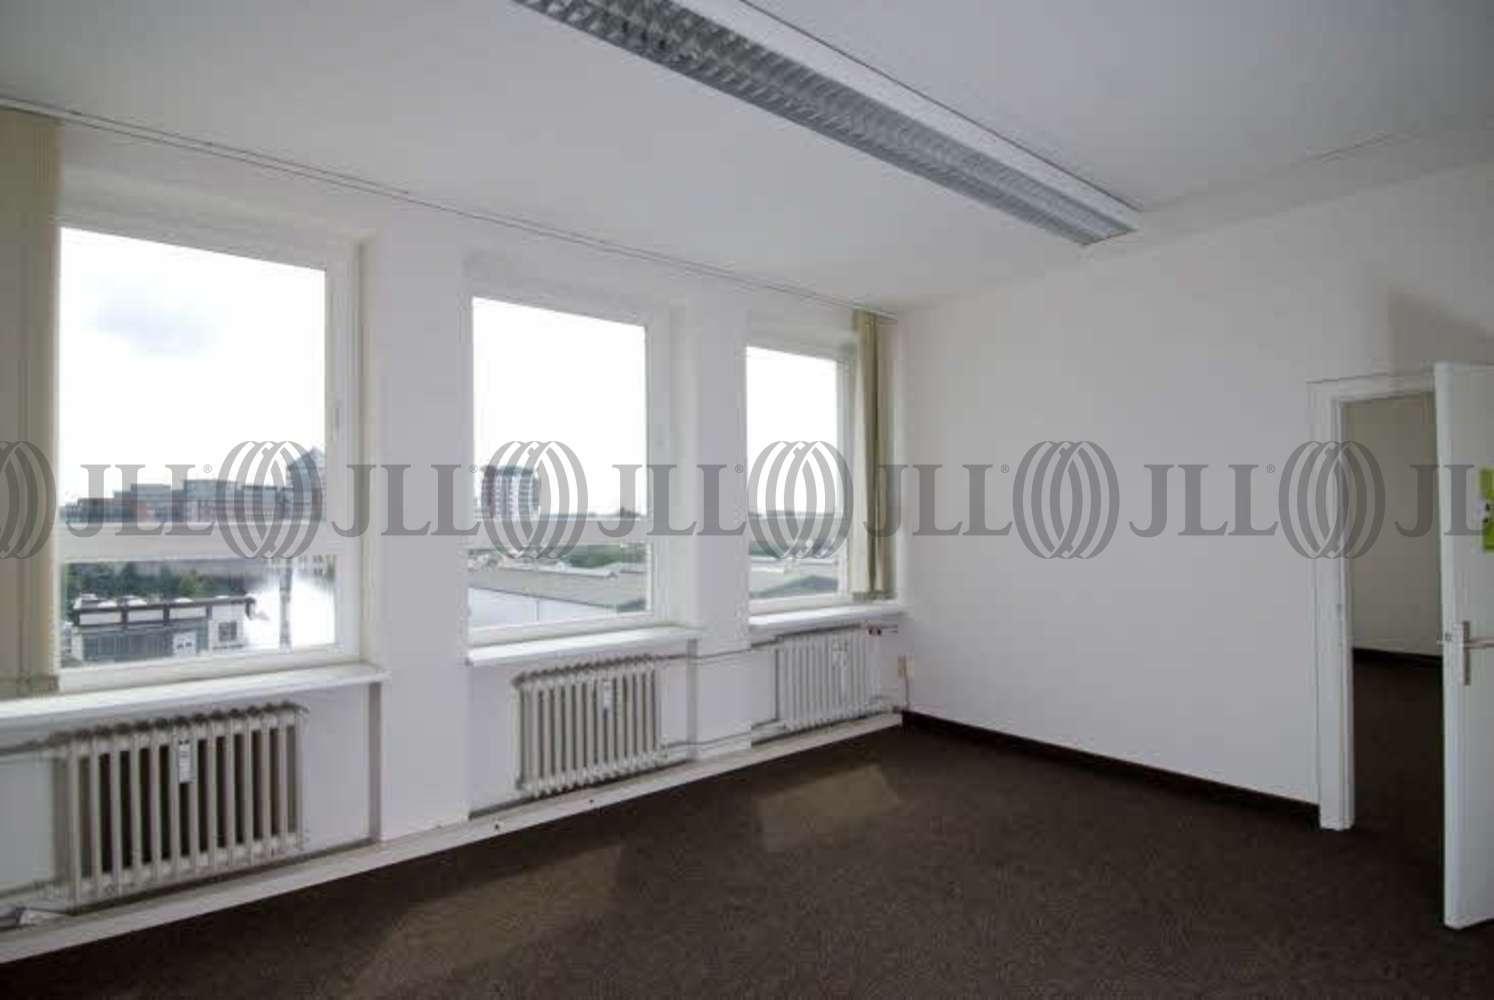 Büros Hamburg, 20537 - Büro - Hamburg, Hammerbrook - H1045 - 9541557